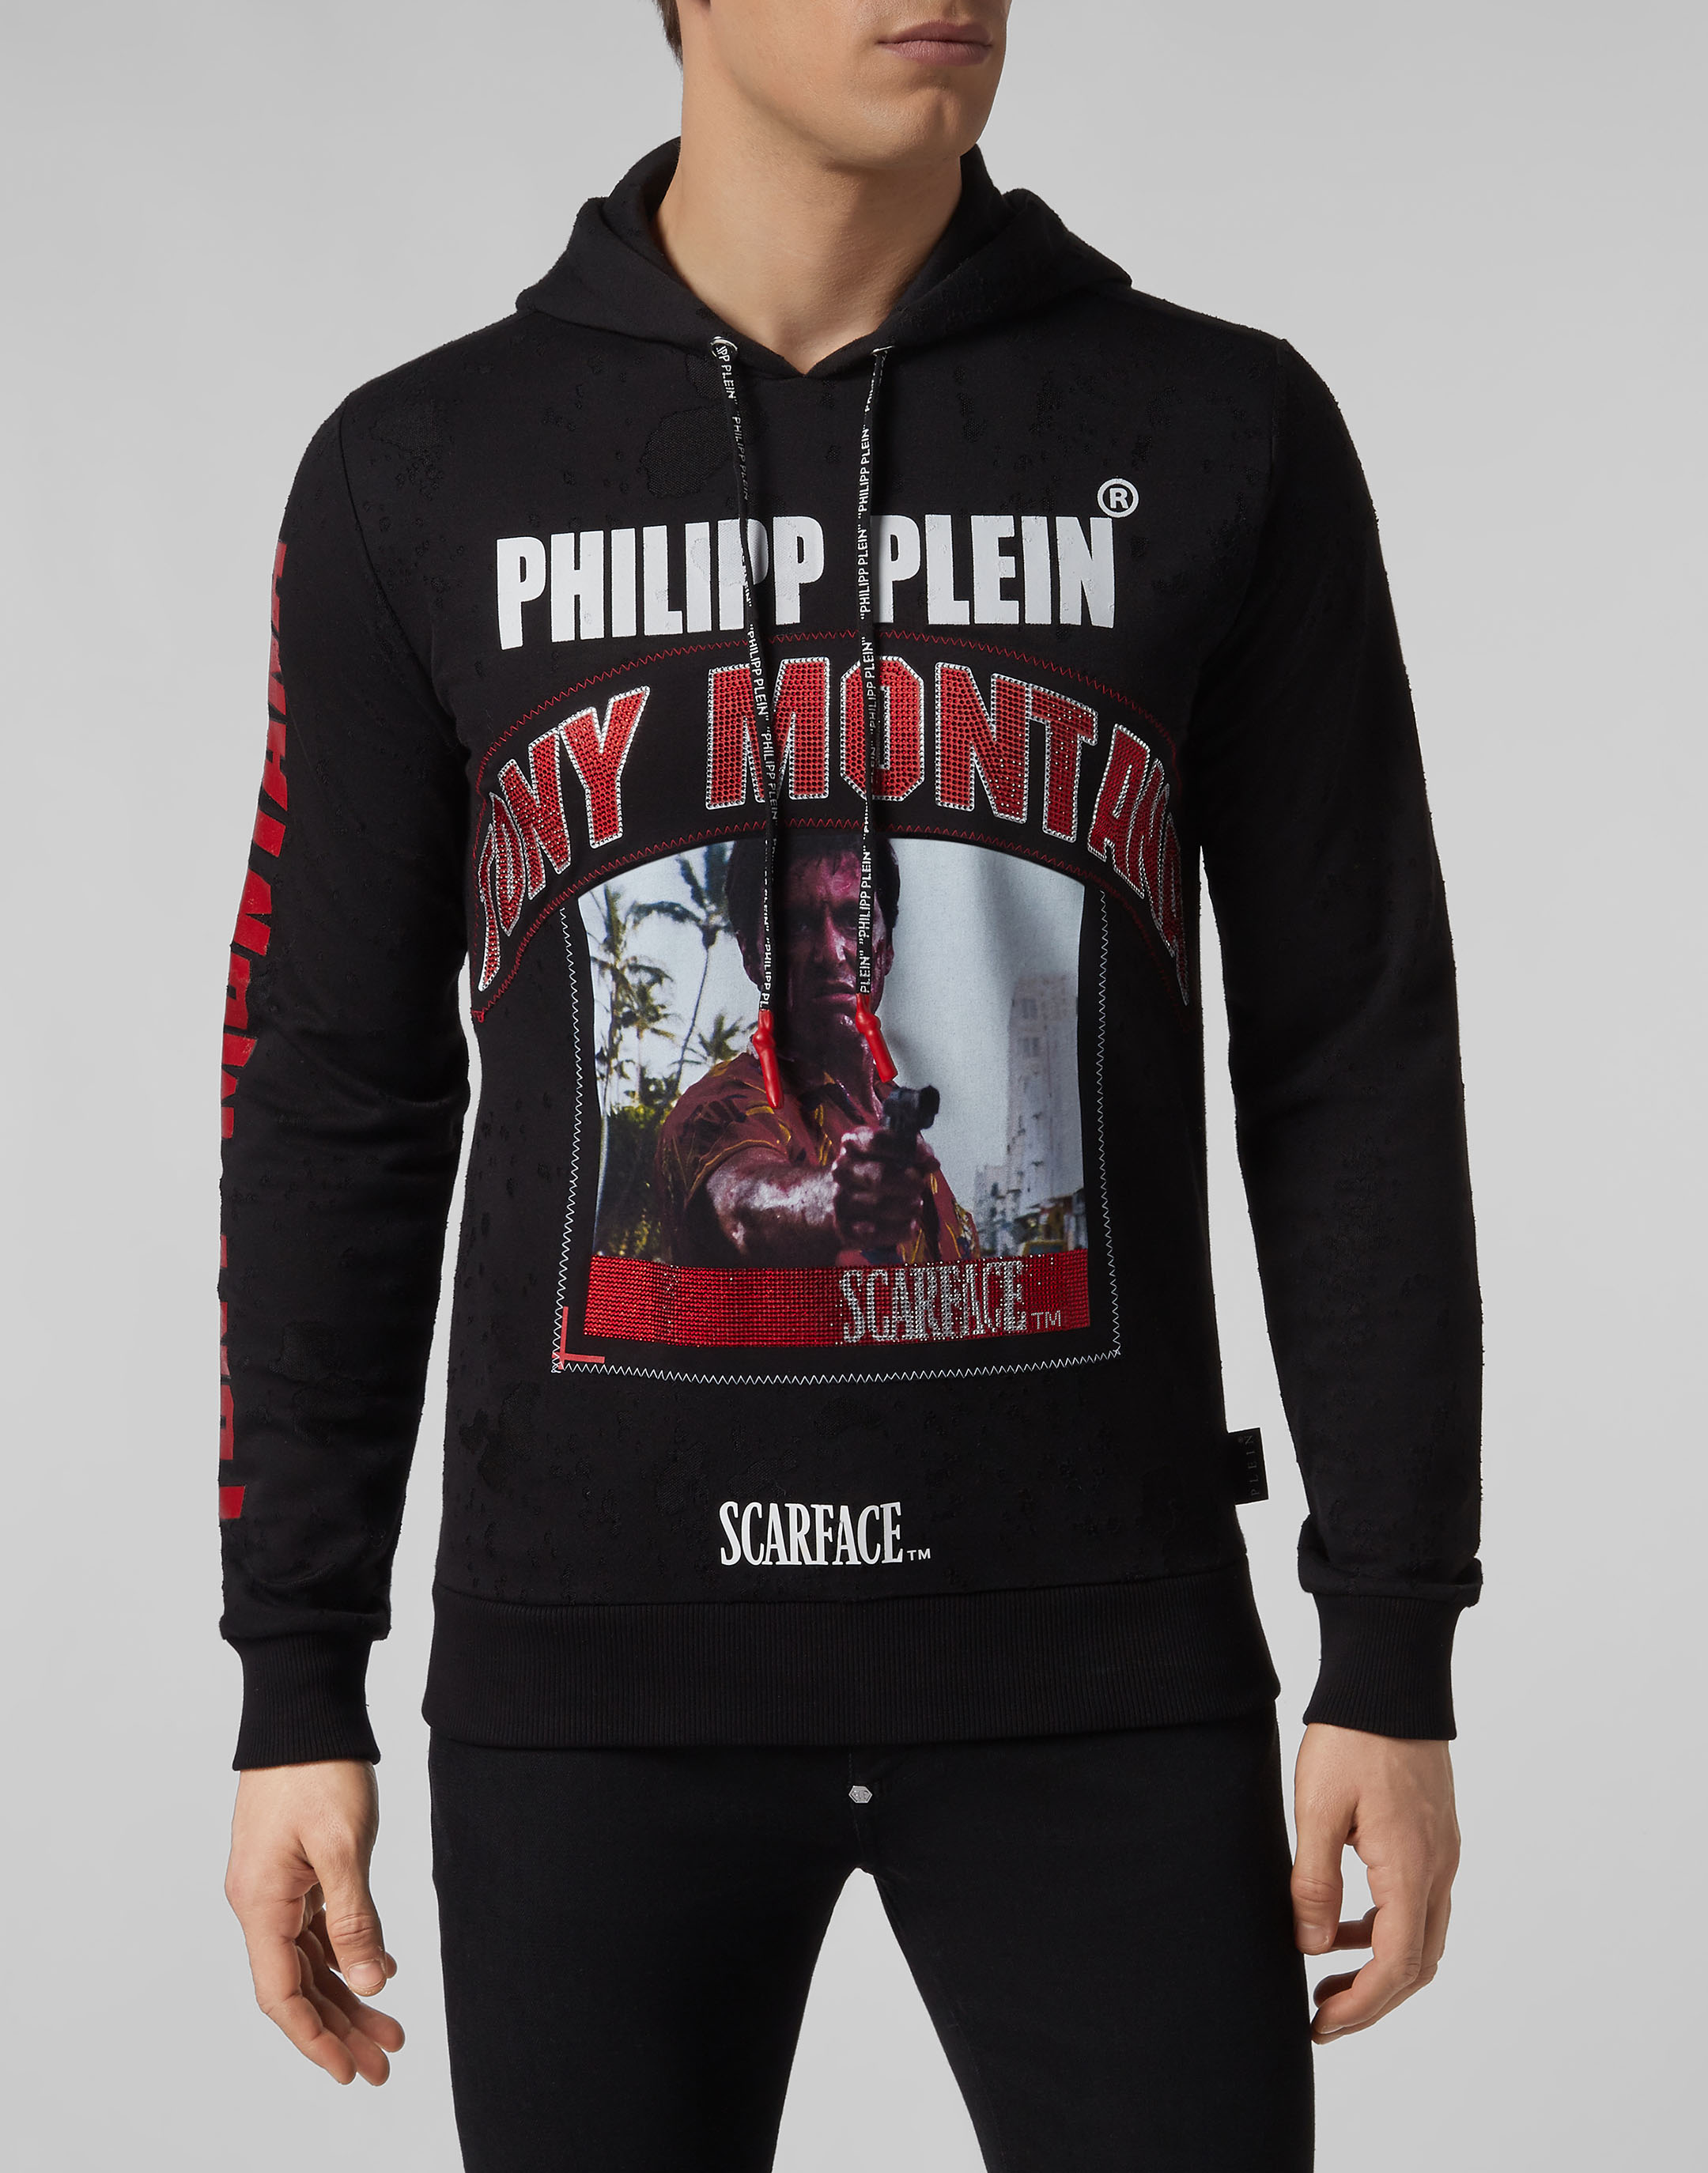 Hoodie sweatshirt Scarface   Philipp Plein 9f21aed9297